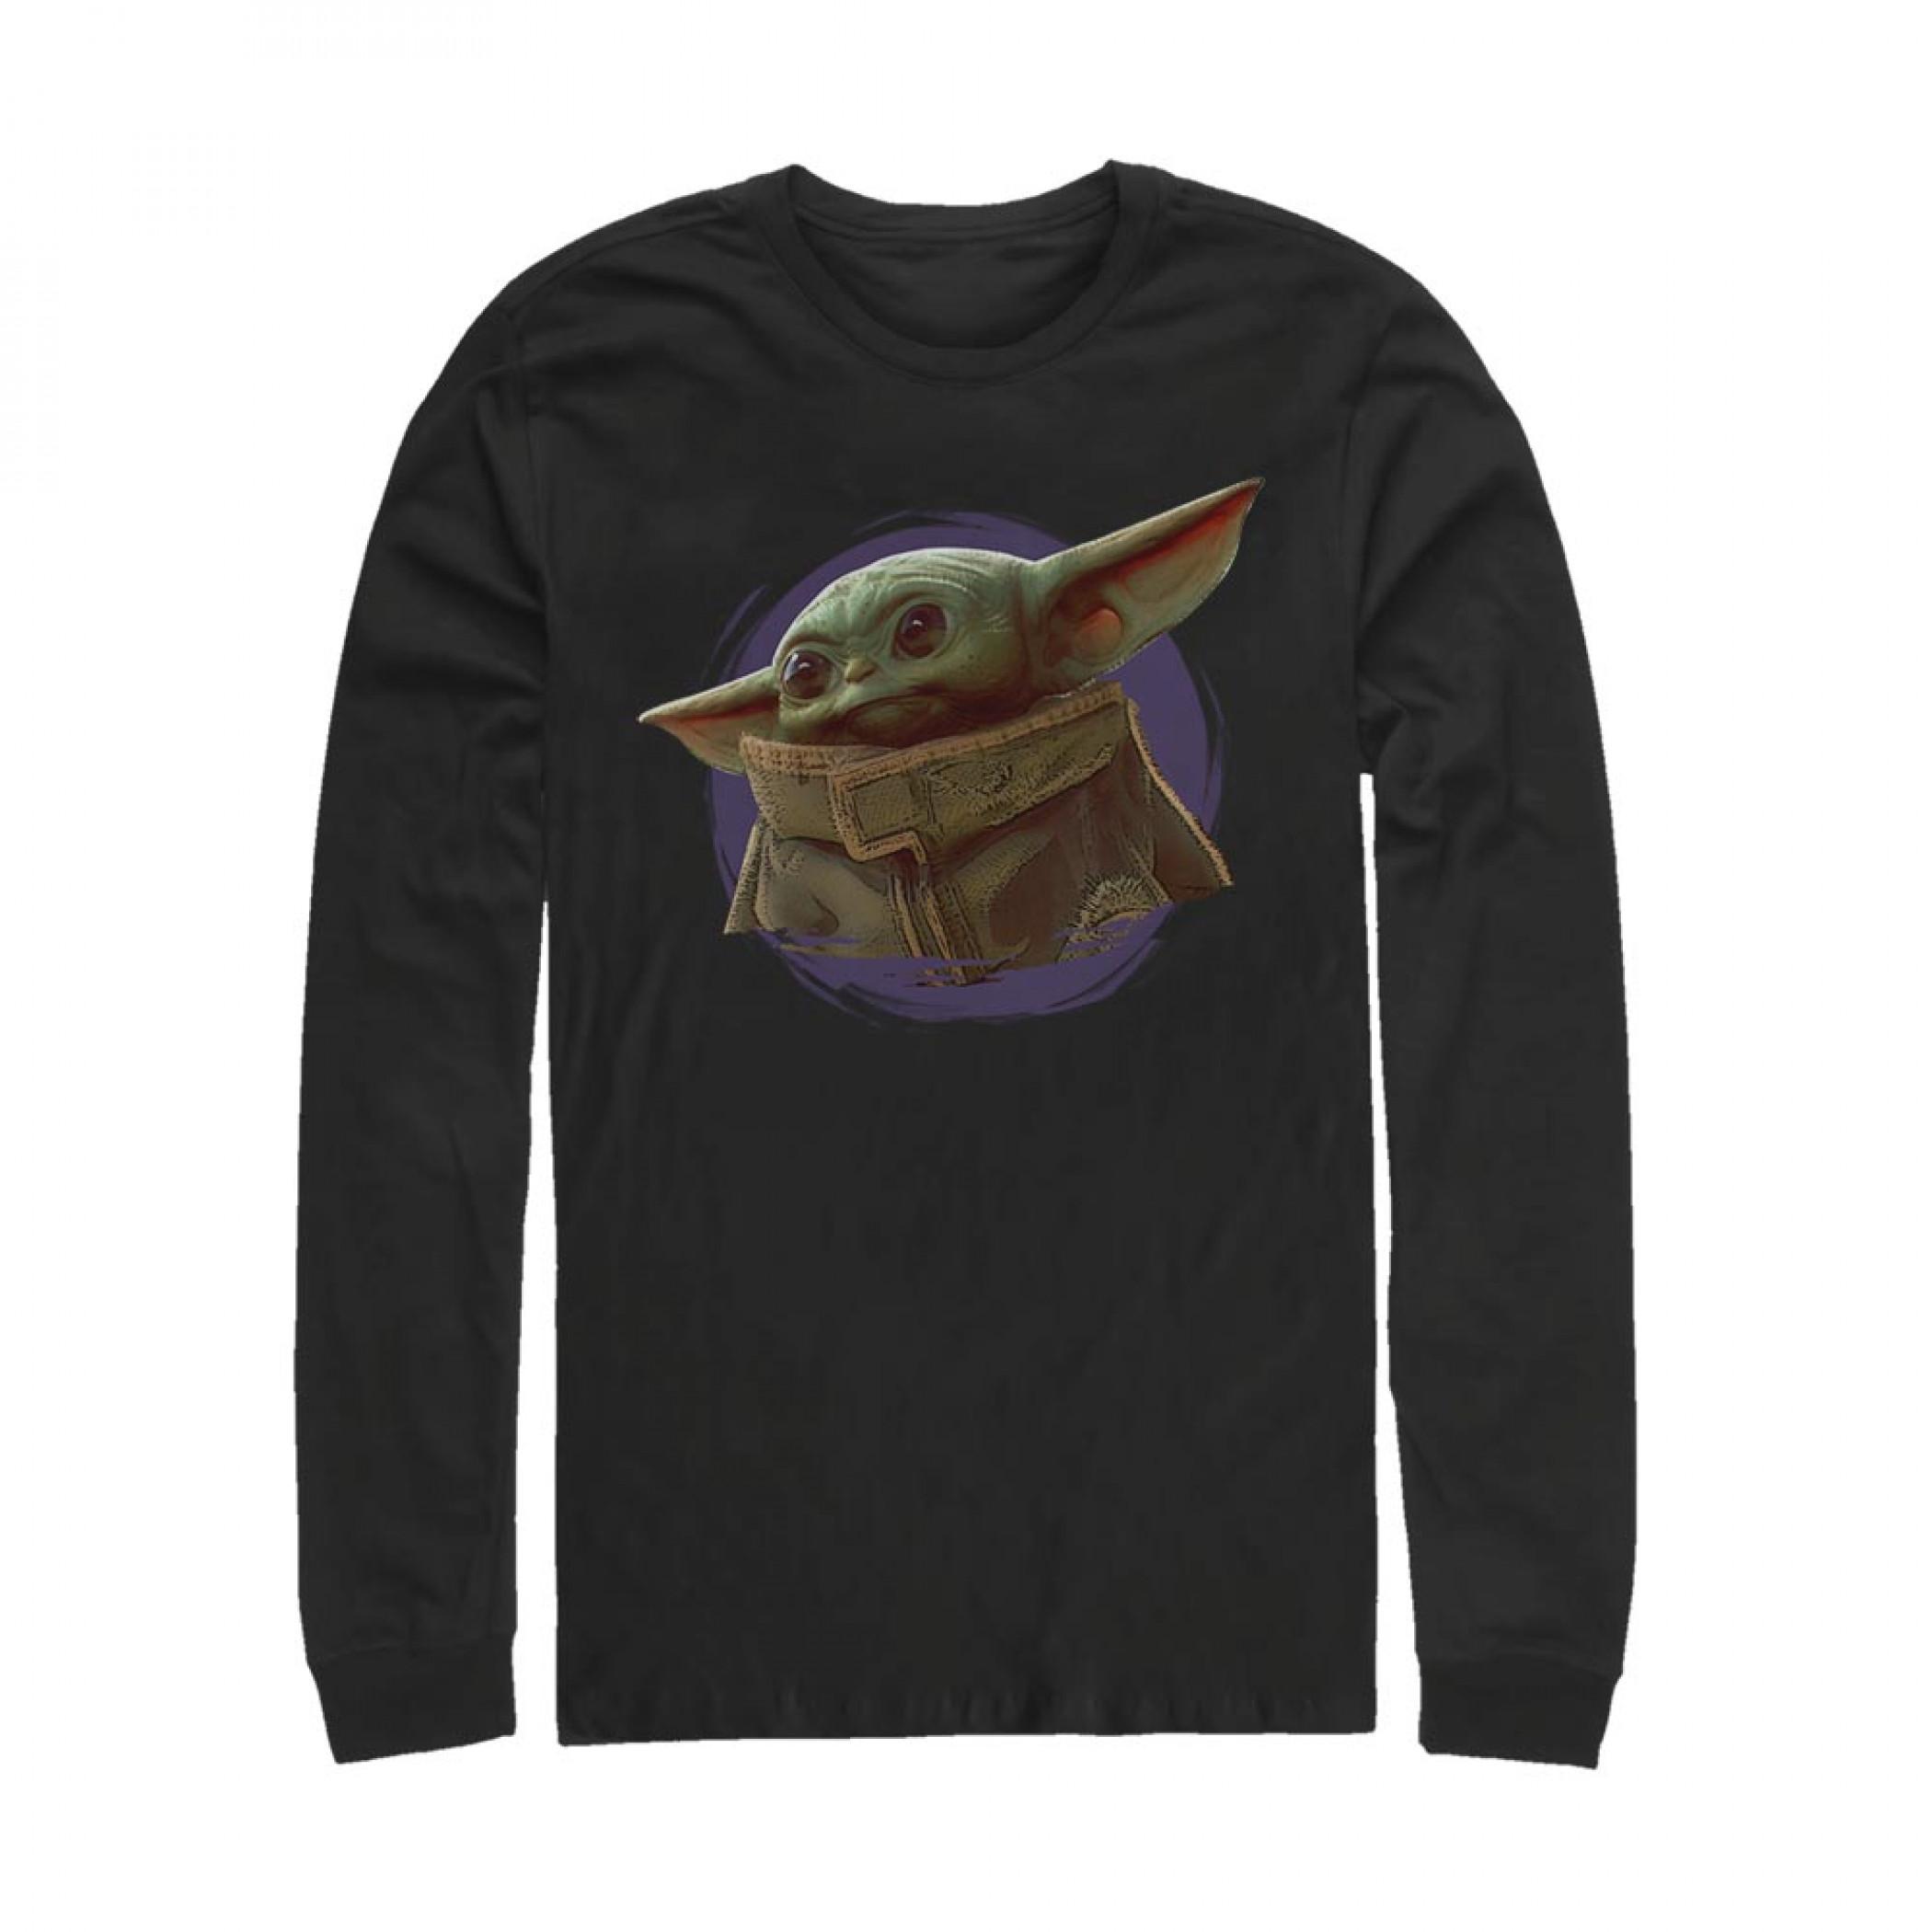 Star Wars The Mandalorian The Child Circle Halo Long Sleeve Shirt